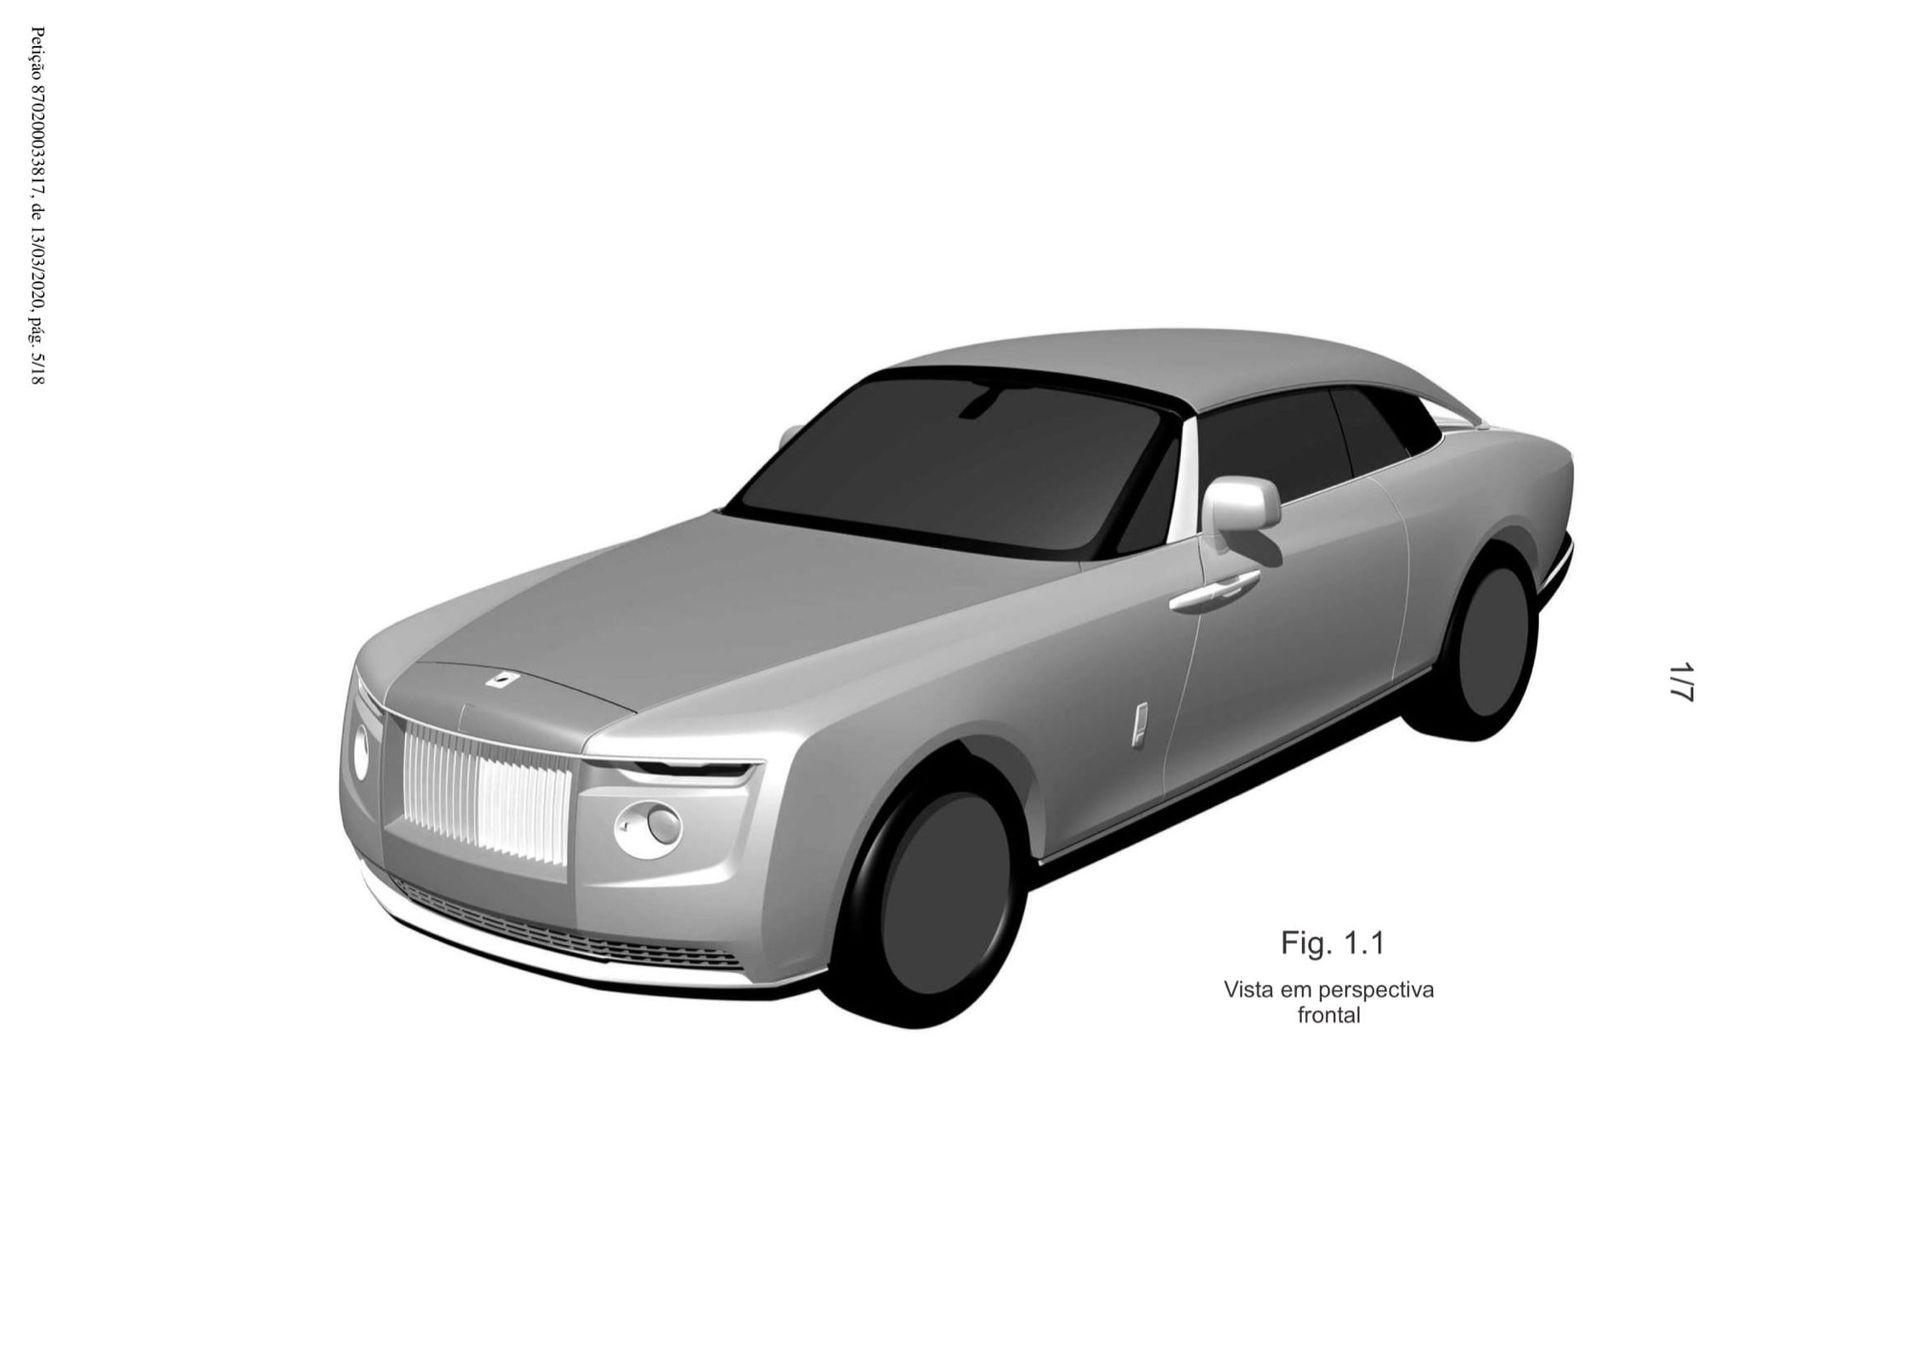 Patentritningar visar ny unik Rolls-Royce